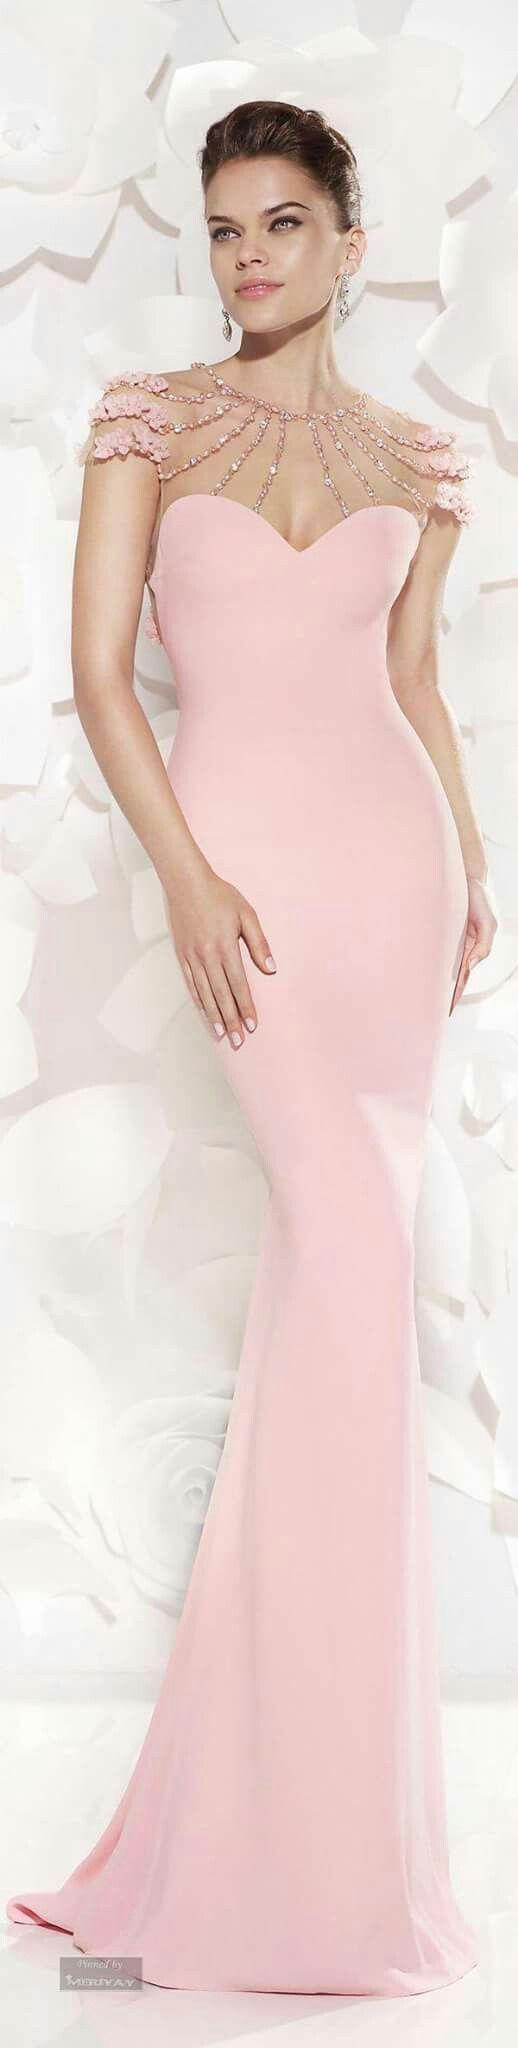 107 best vestido de festa images on Pinterest | Nice dresses, Casual ...